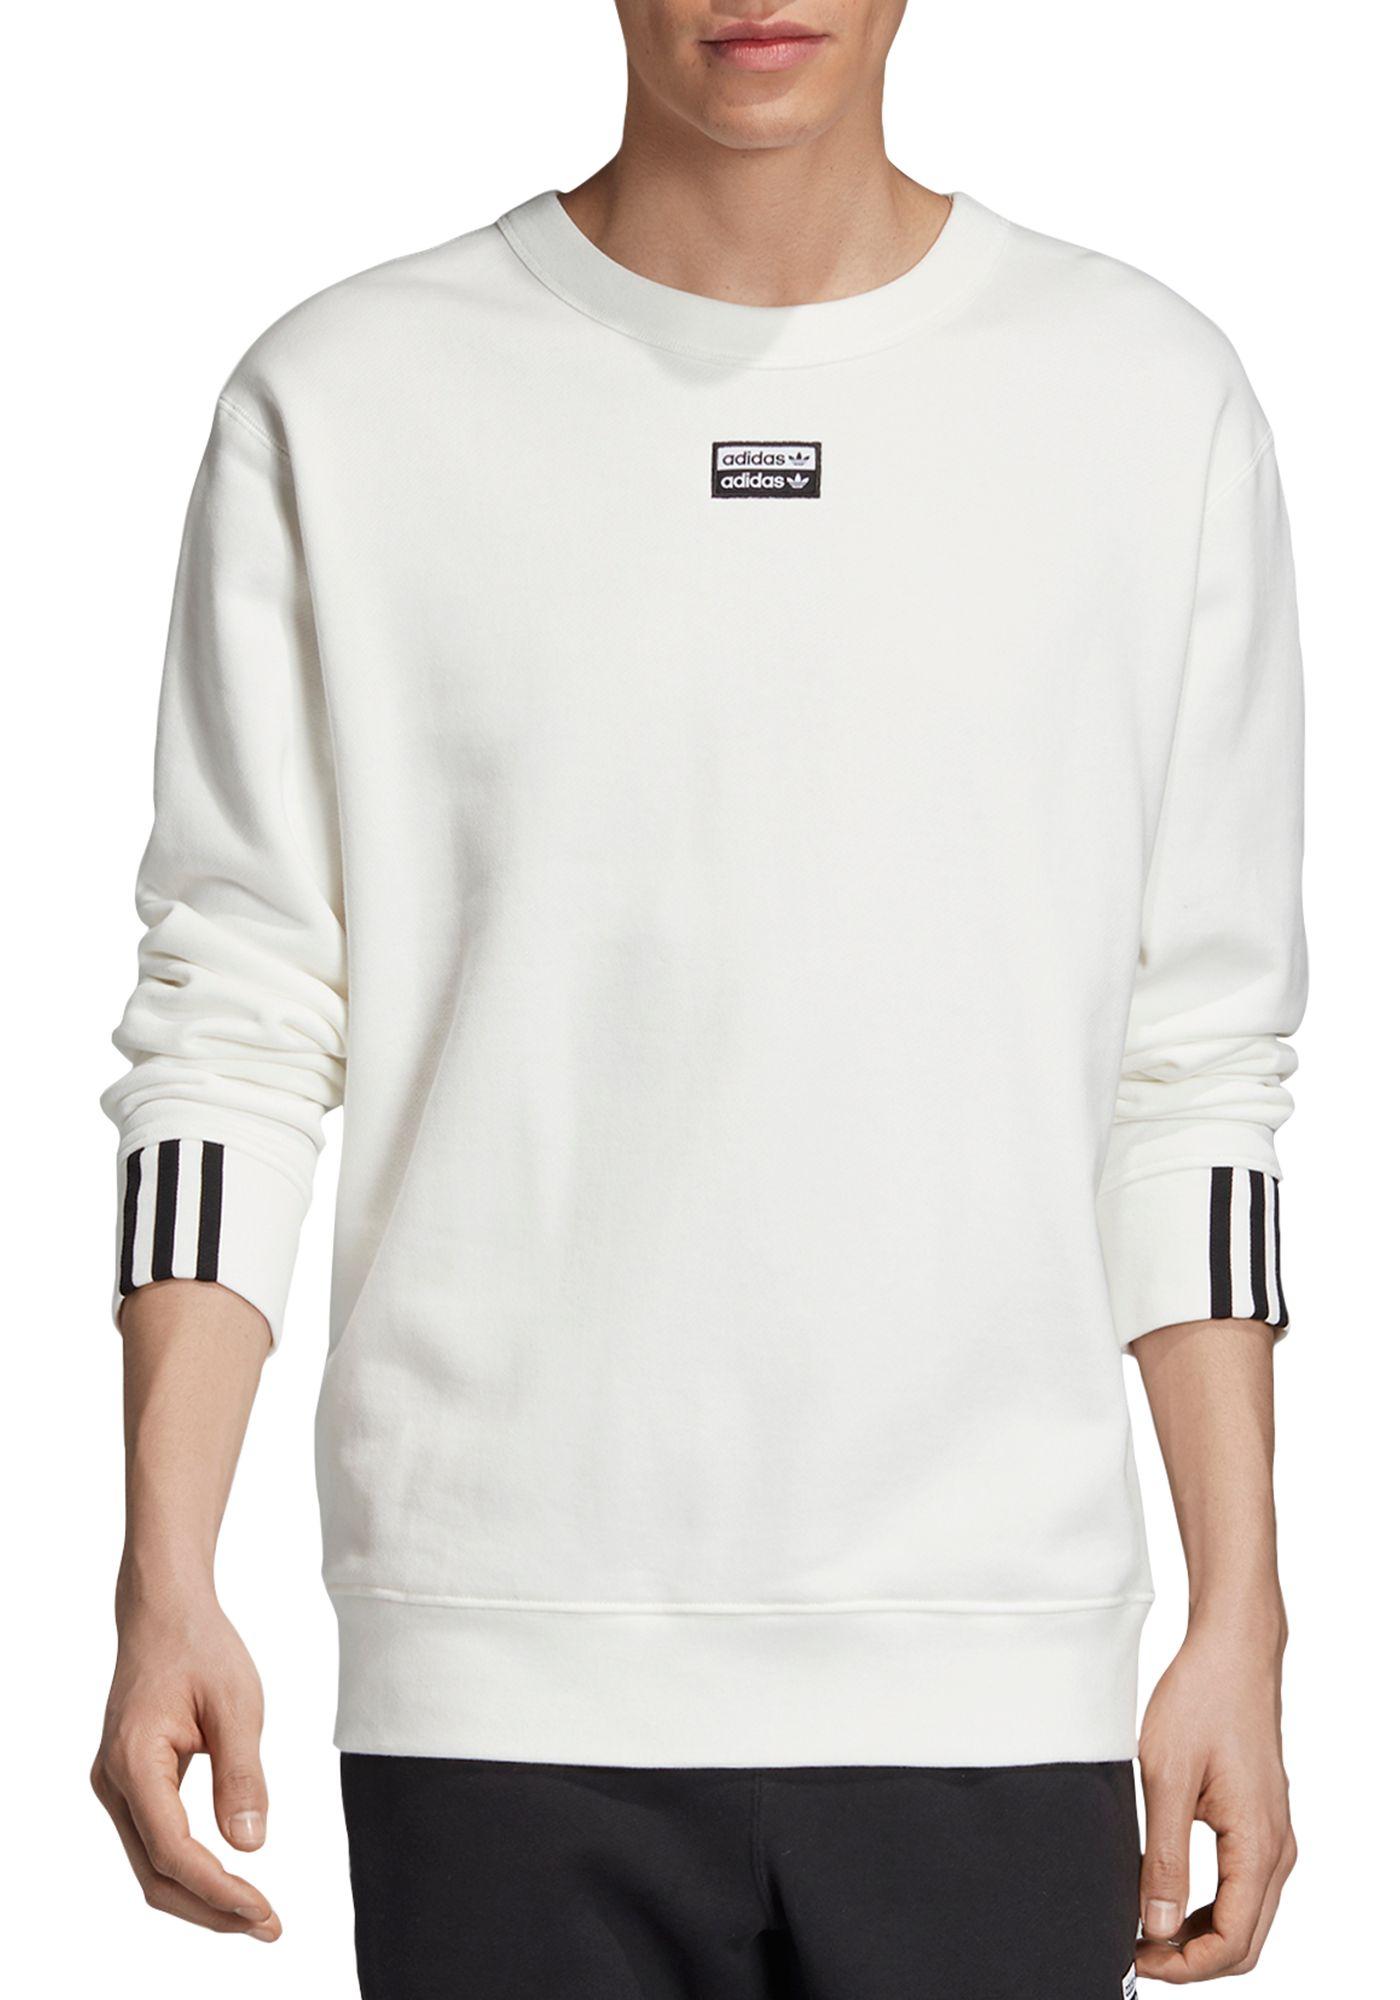 adidas Originals Men's RYV Crew Sweatshirt